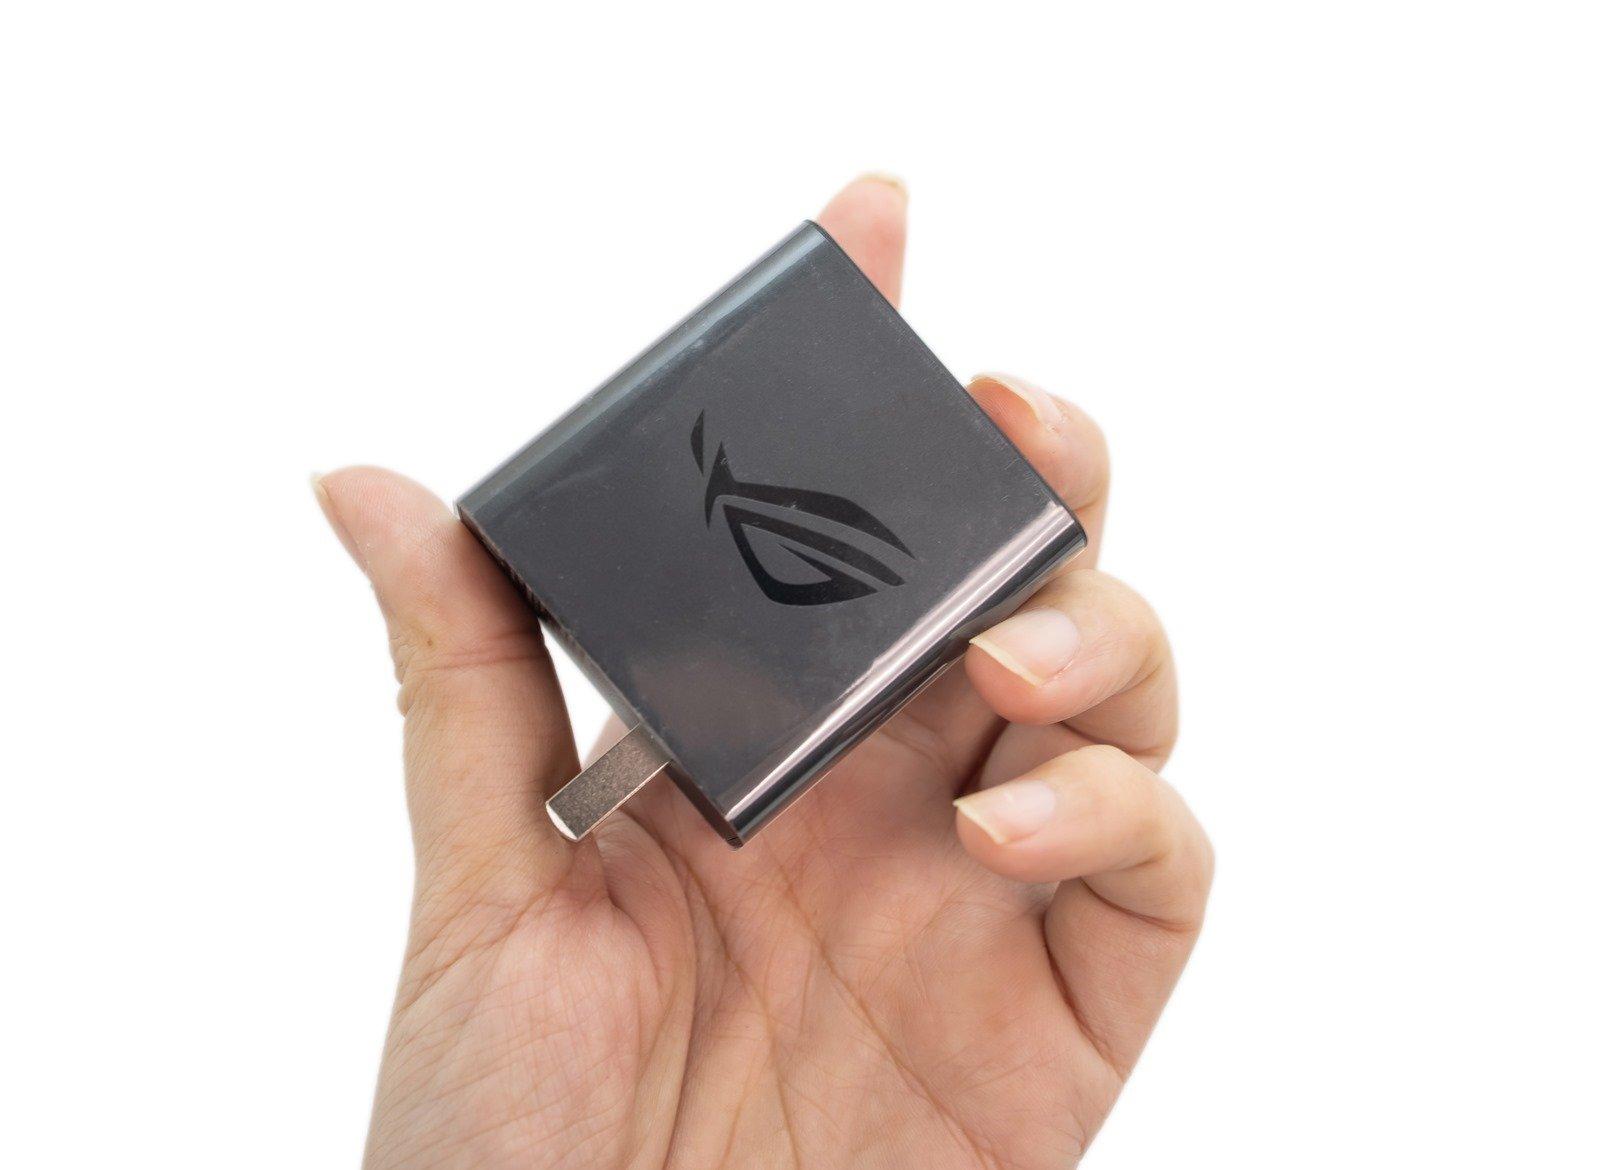 ASUS 台版 ROG Phone 5 白色新款開箱動手玩,看看盒中有什麼?( ROG Phone 5 Unboxing) @3C 達人廖阿輝